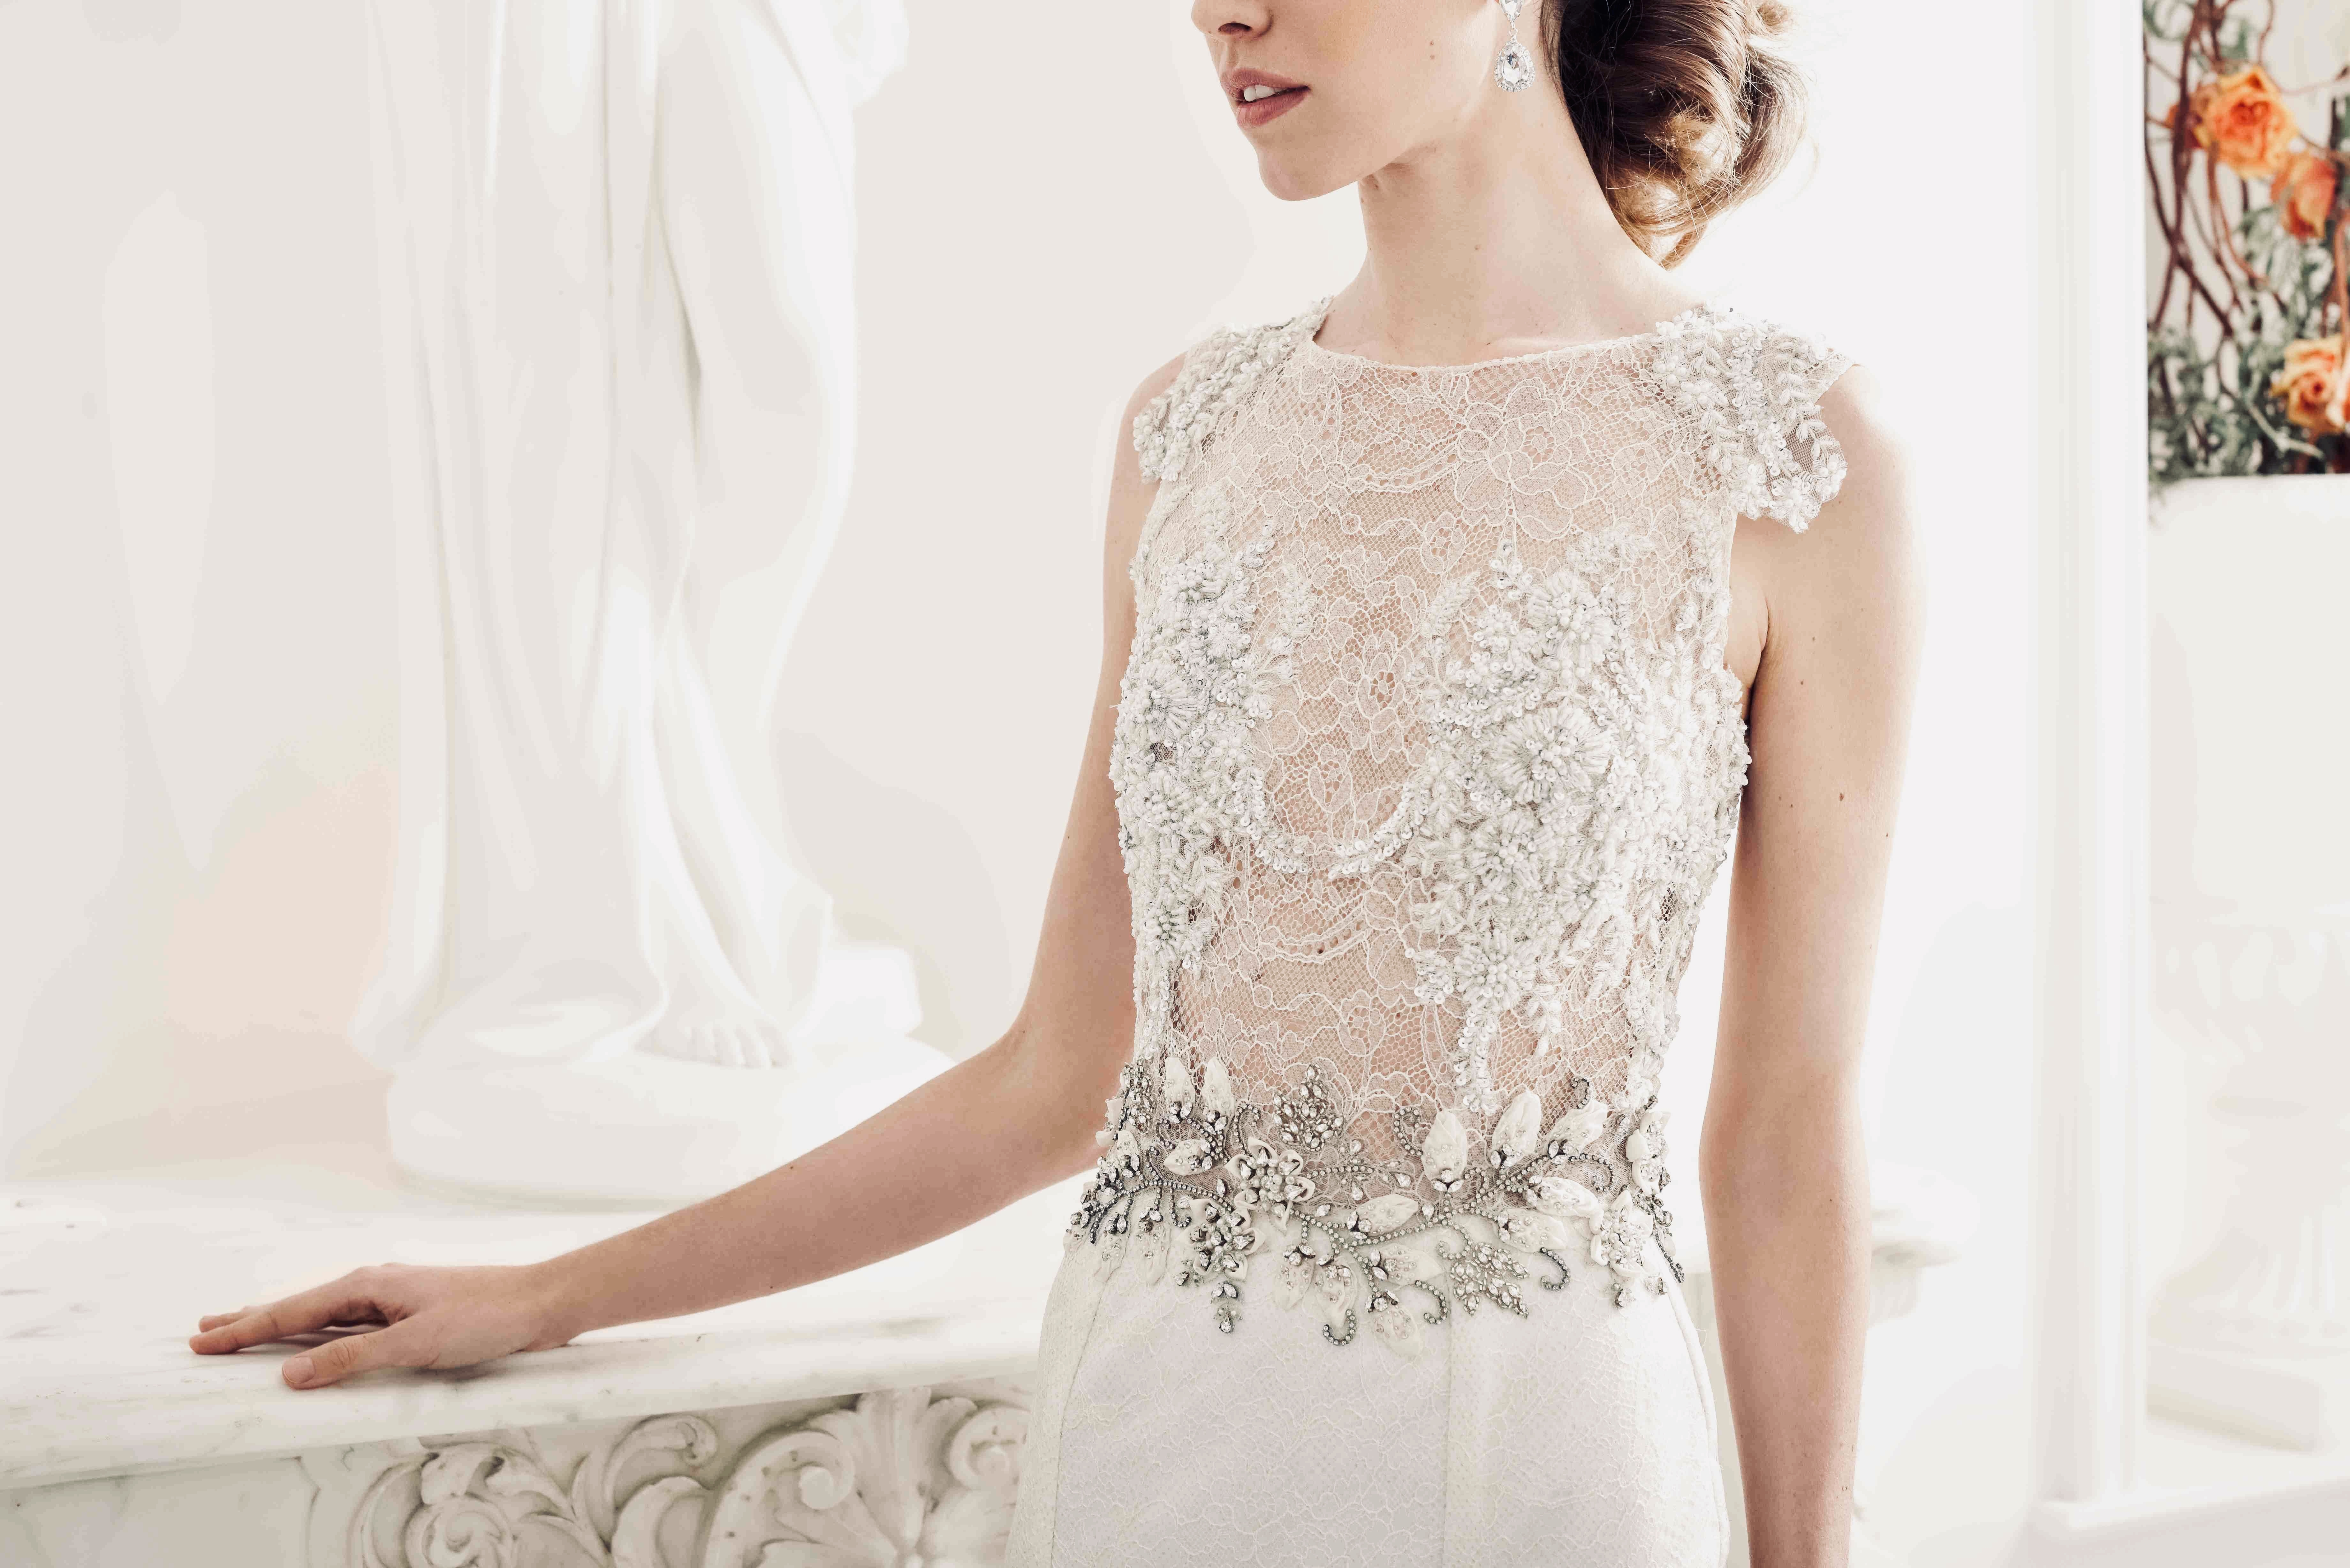 Robe Cristal Chic